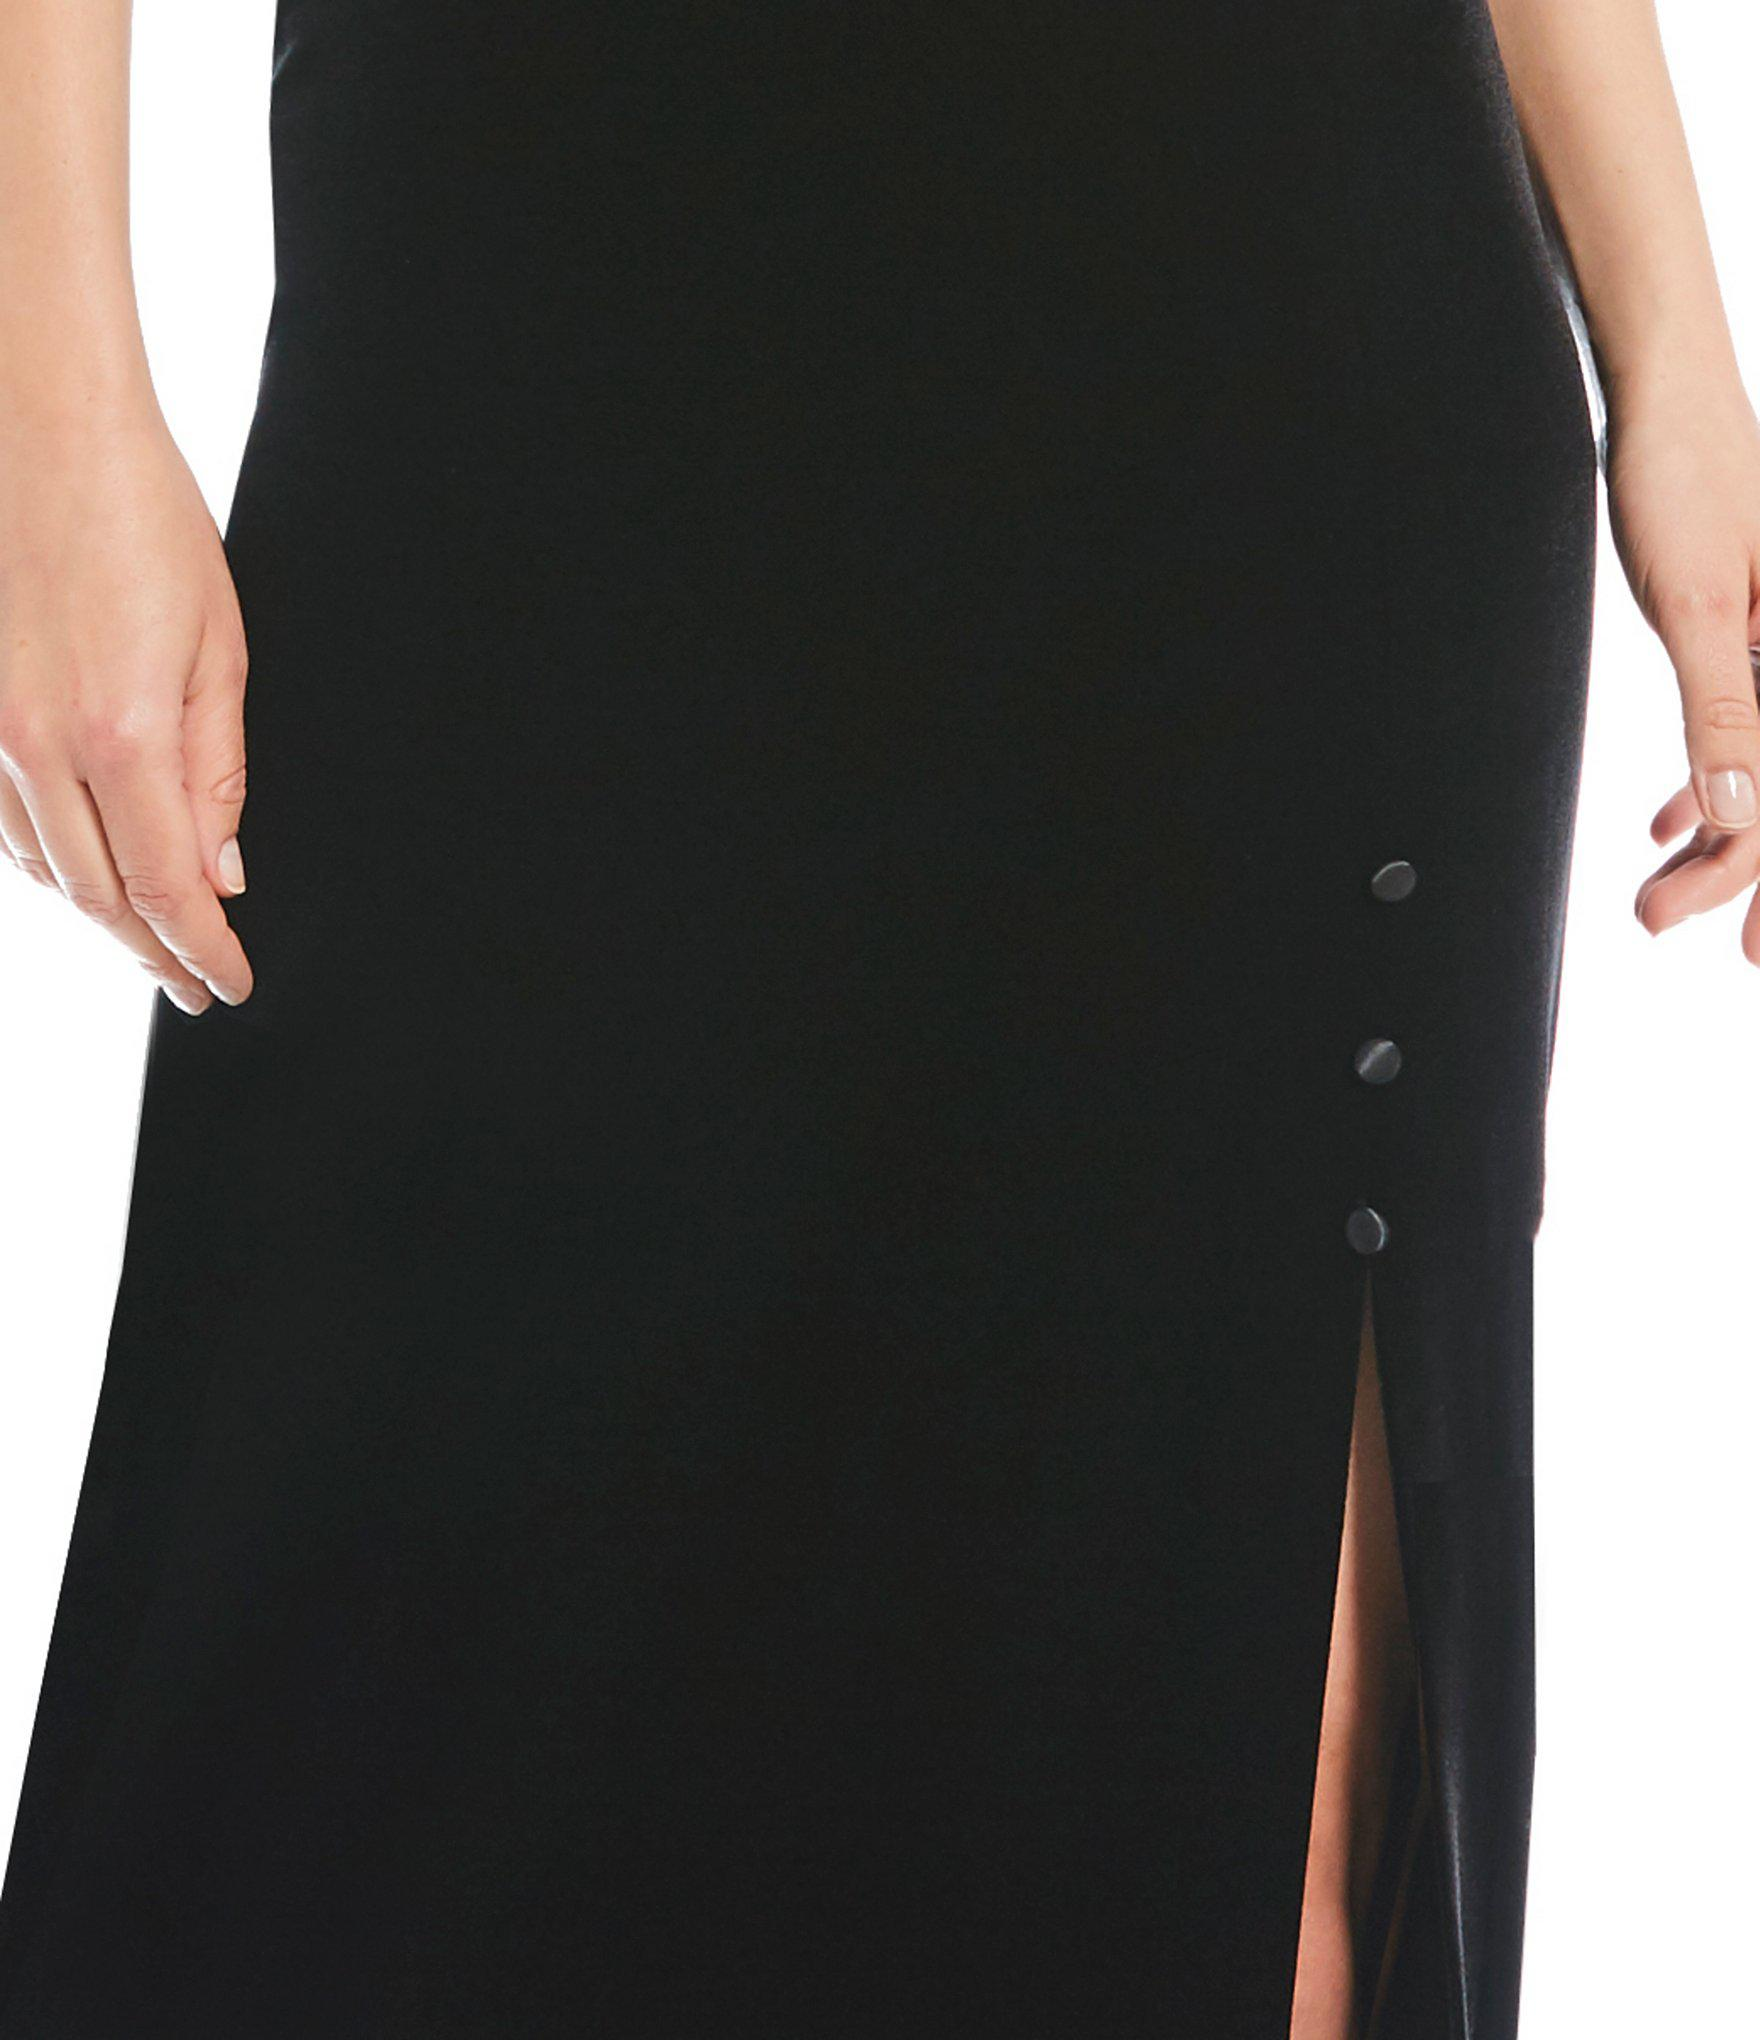 544ae7e0fdf Dillards Petite Long Skirts - Gomes Weine AG